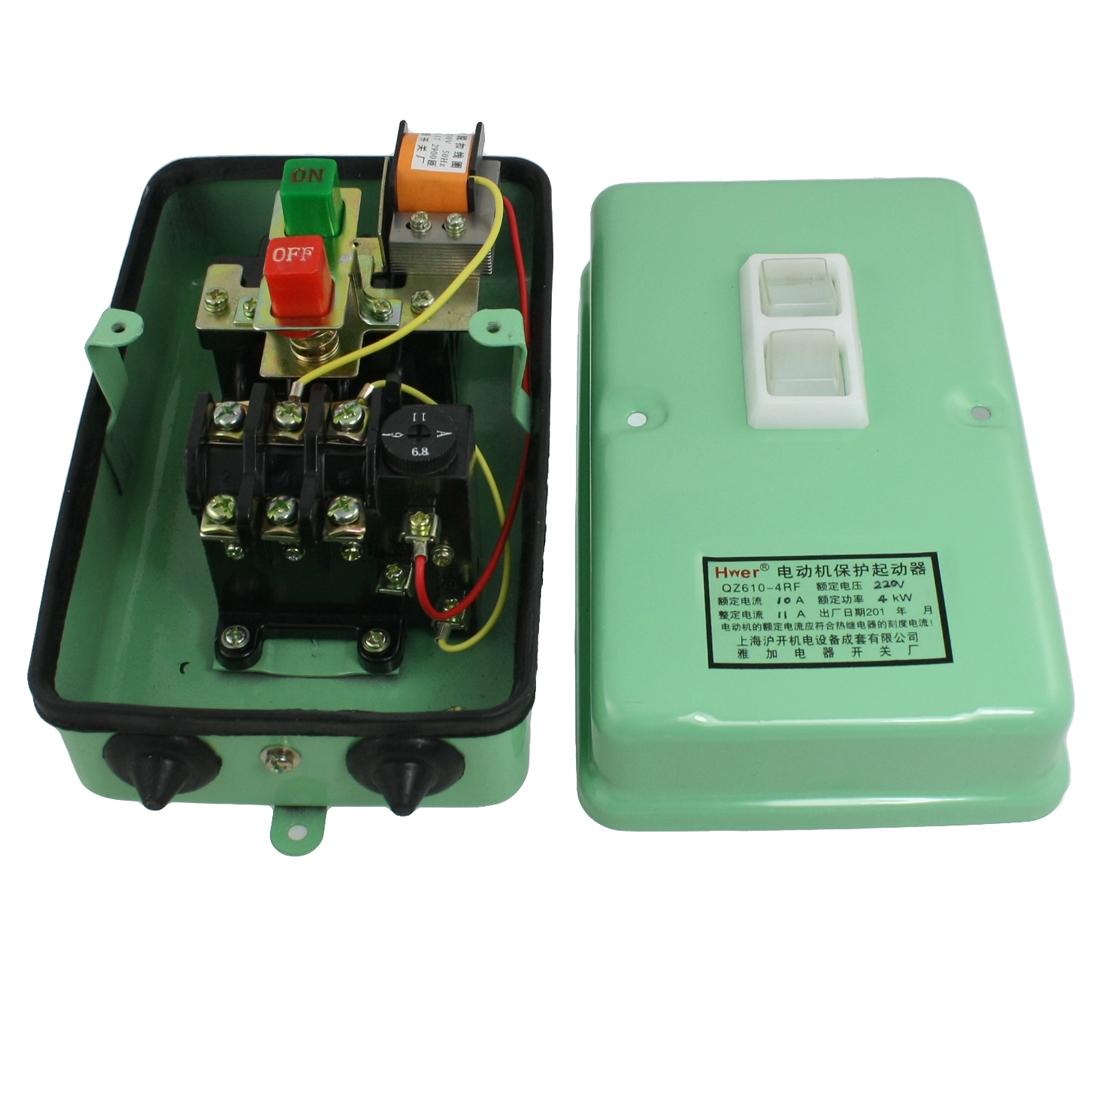 120-430V Coil Shunt Trip Motor Starter Protector 3Pole 6.8-11A 5.4HP